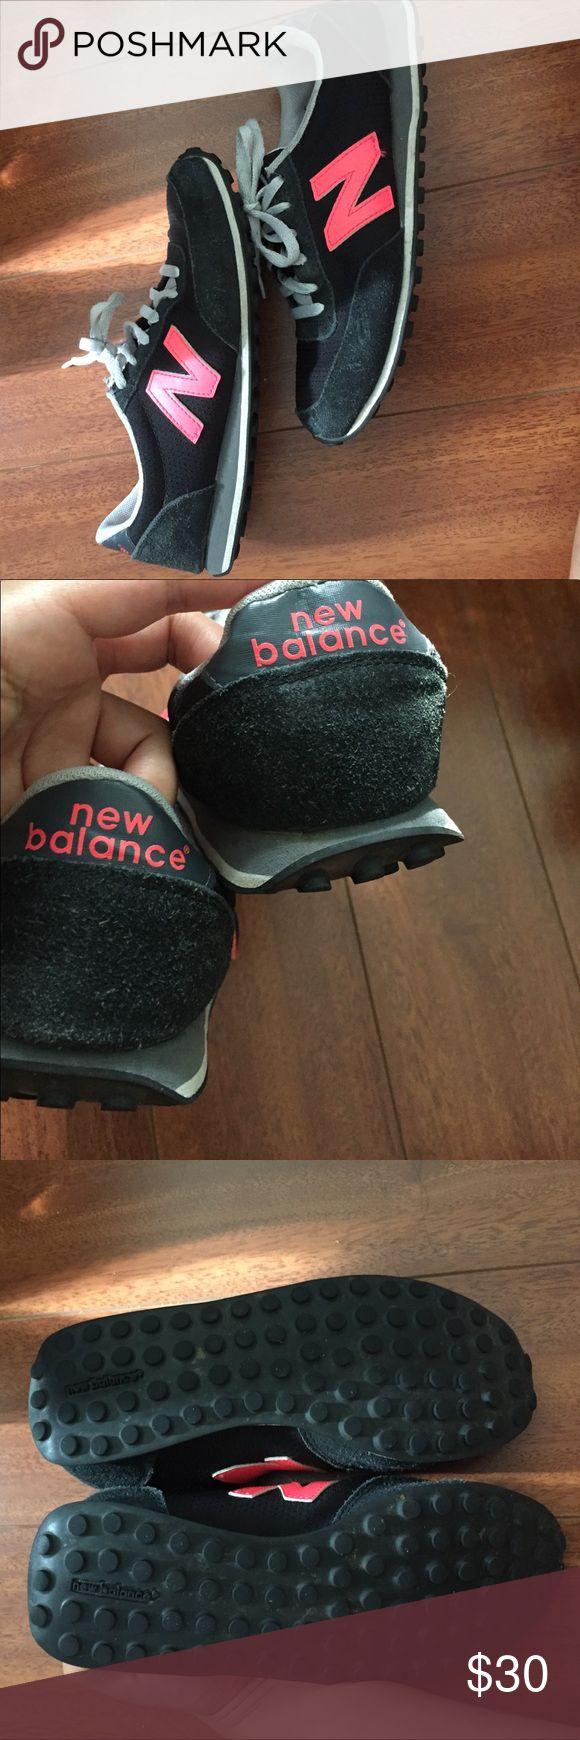 🔴final price drop🔴 original New Balance Good condition new balance 410. Offers welcomed New Balance Shoes Athletic Shoes